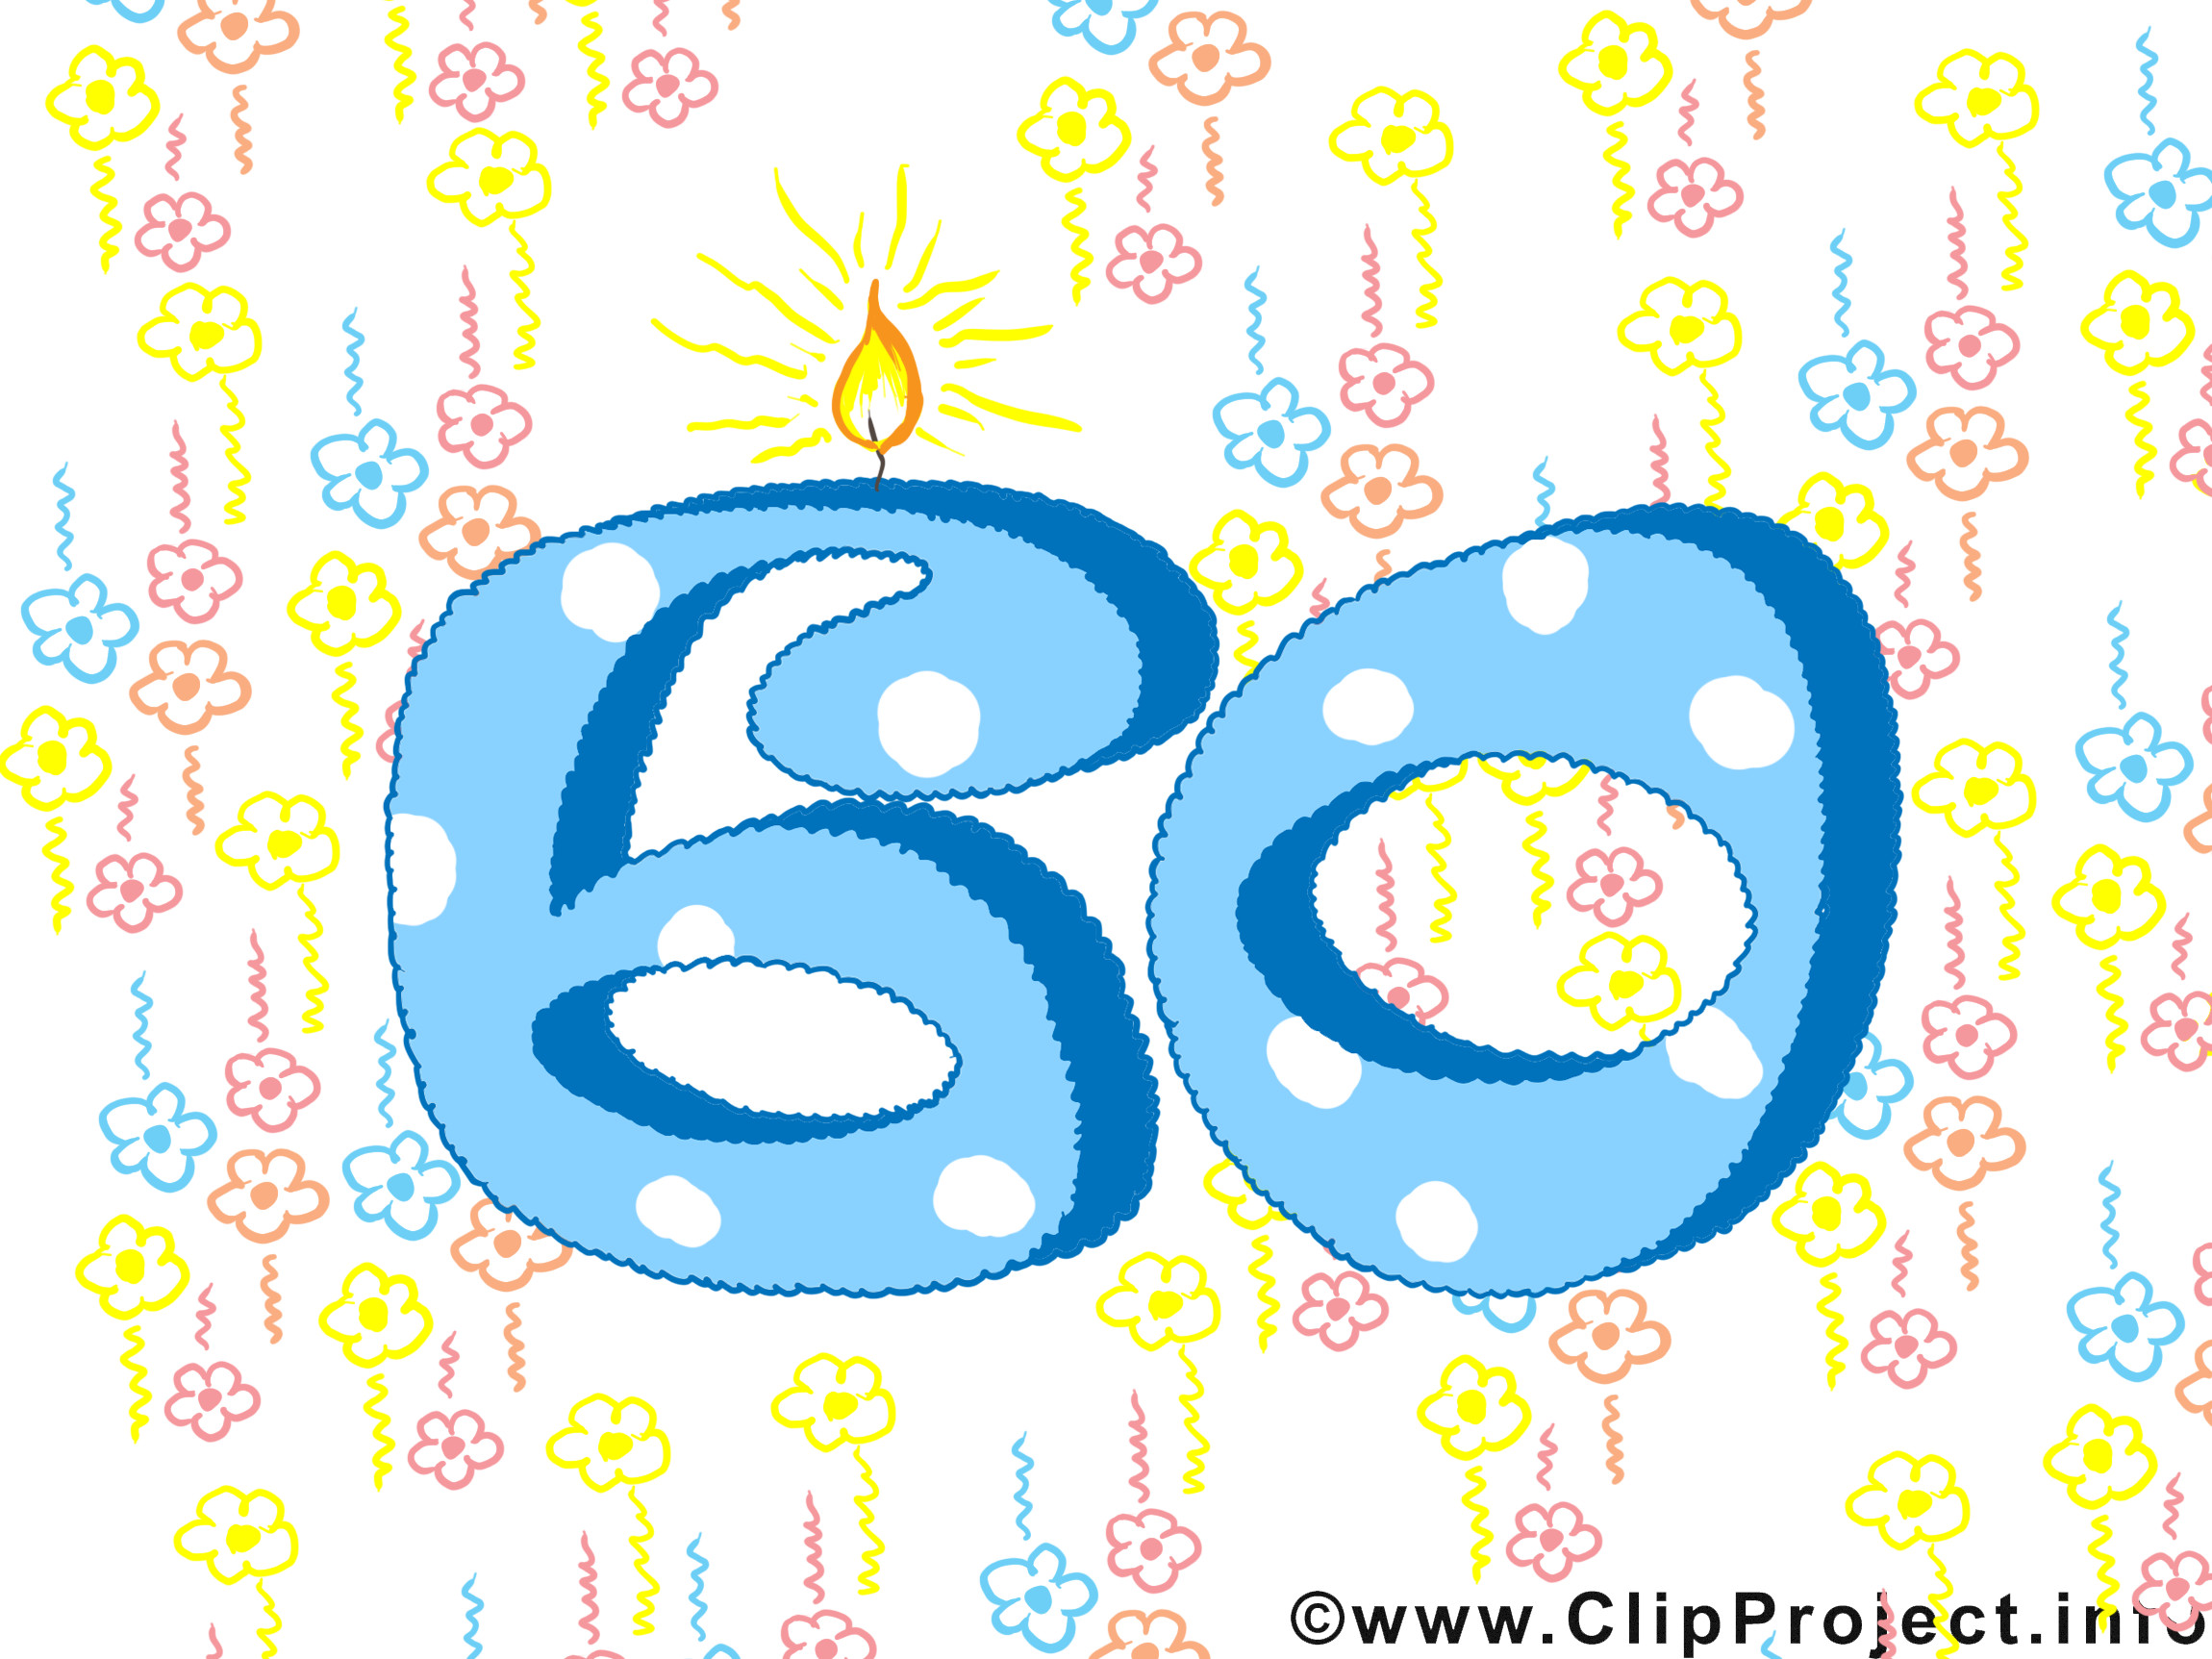 Geburtstagswünsche Zum 60  Geburtstagswünsche zum 60 Glückwunschkarte gratis